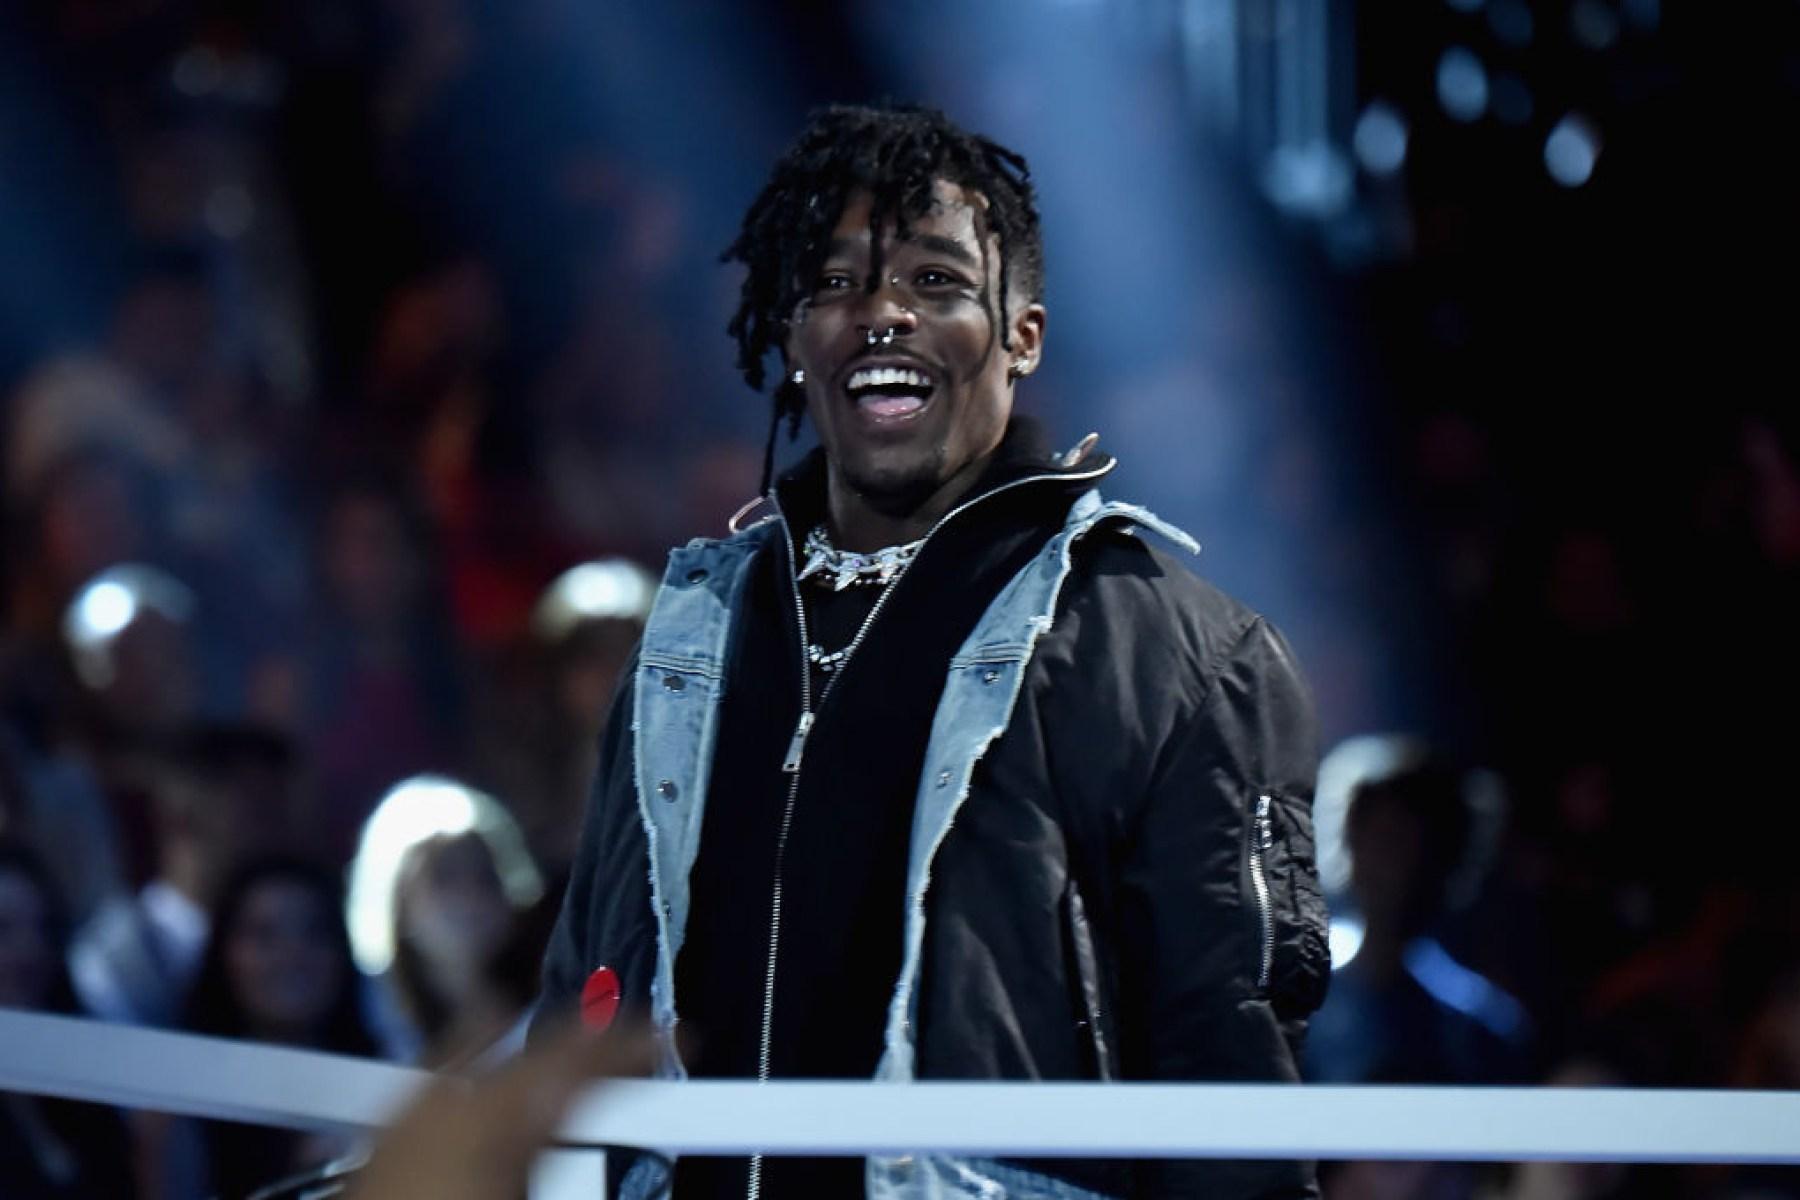 On The Charts Lil Uzi Vert Xxxtentacion Take Top Two Spots Rolling Stone